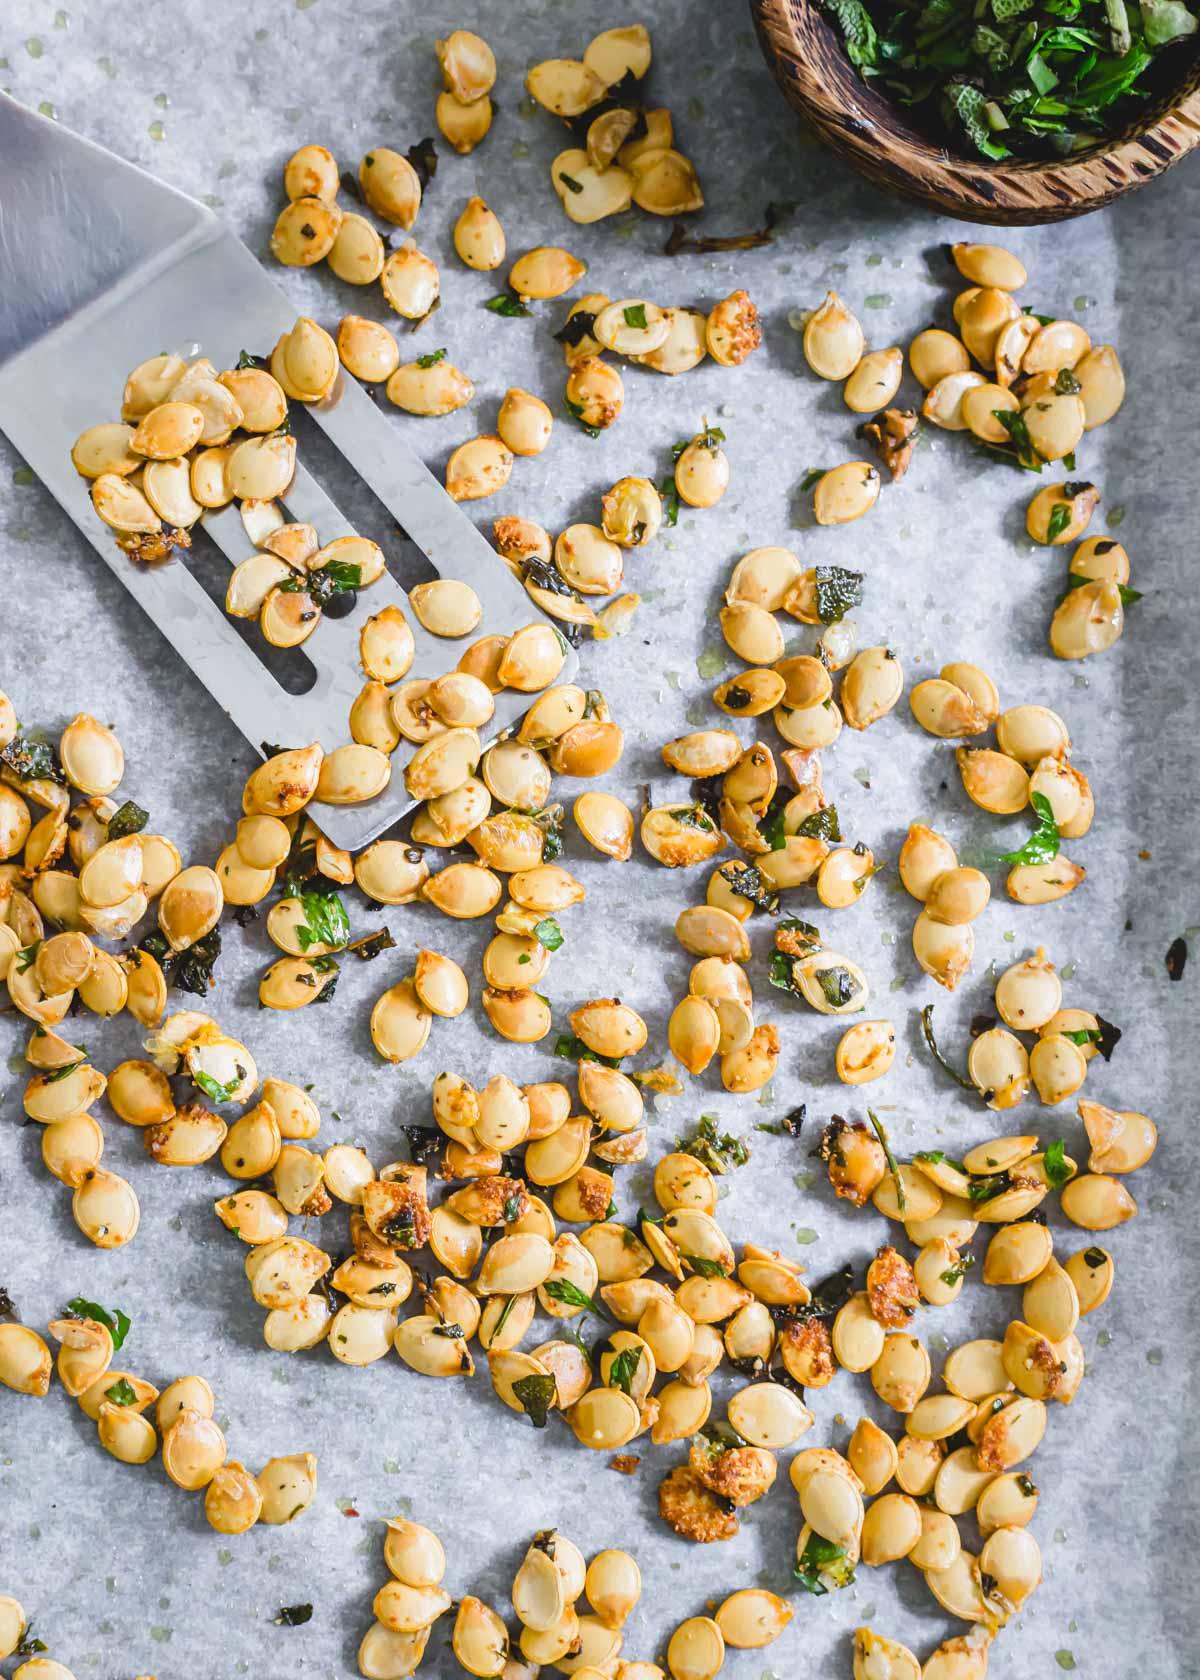 Crispy roasted delicata squash seeds on a baking sheet with spatula.